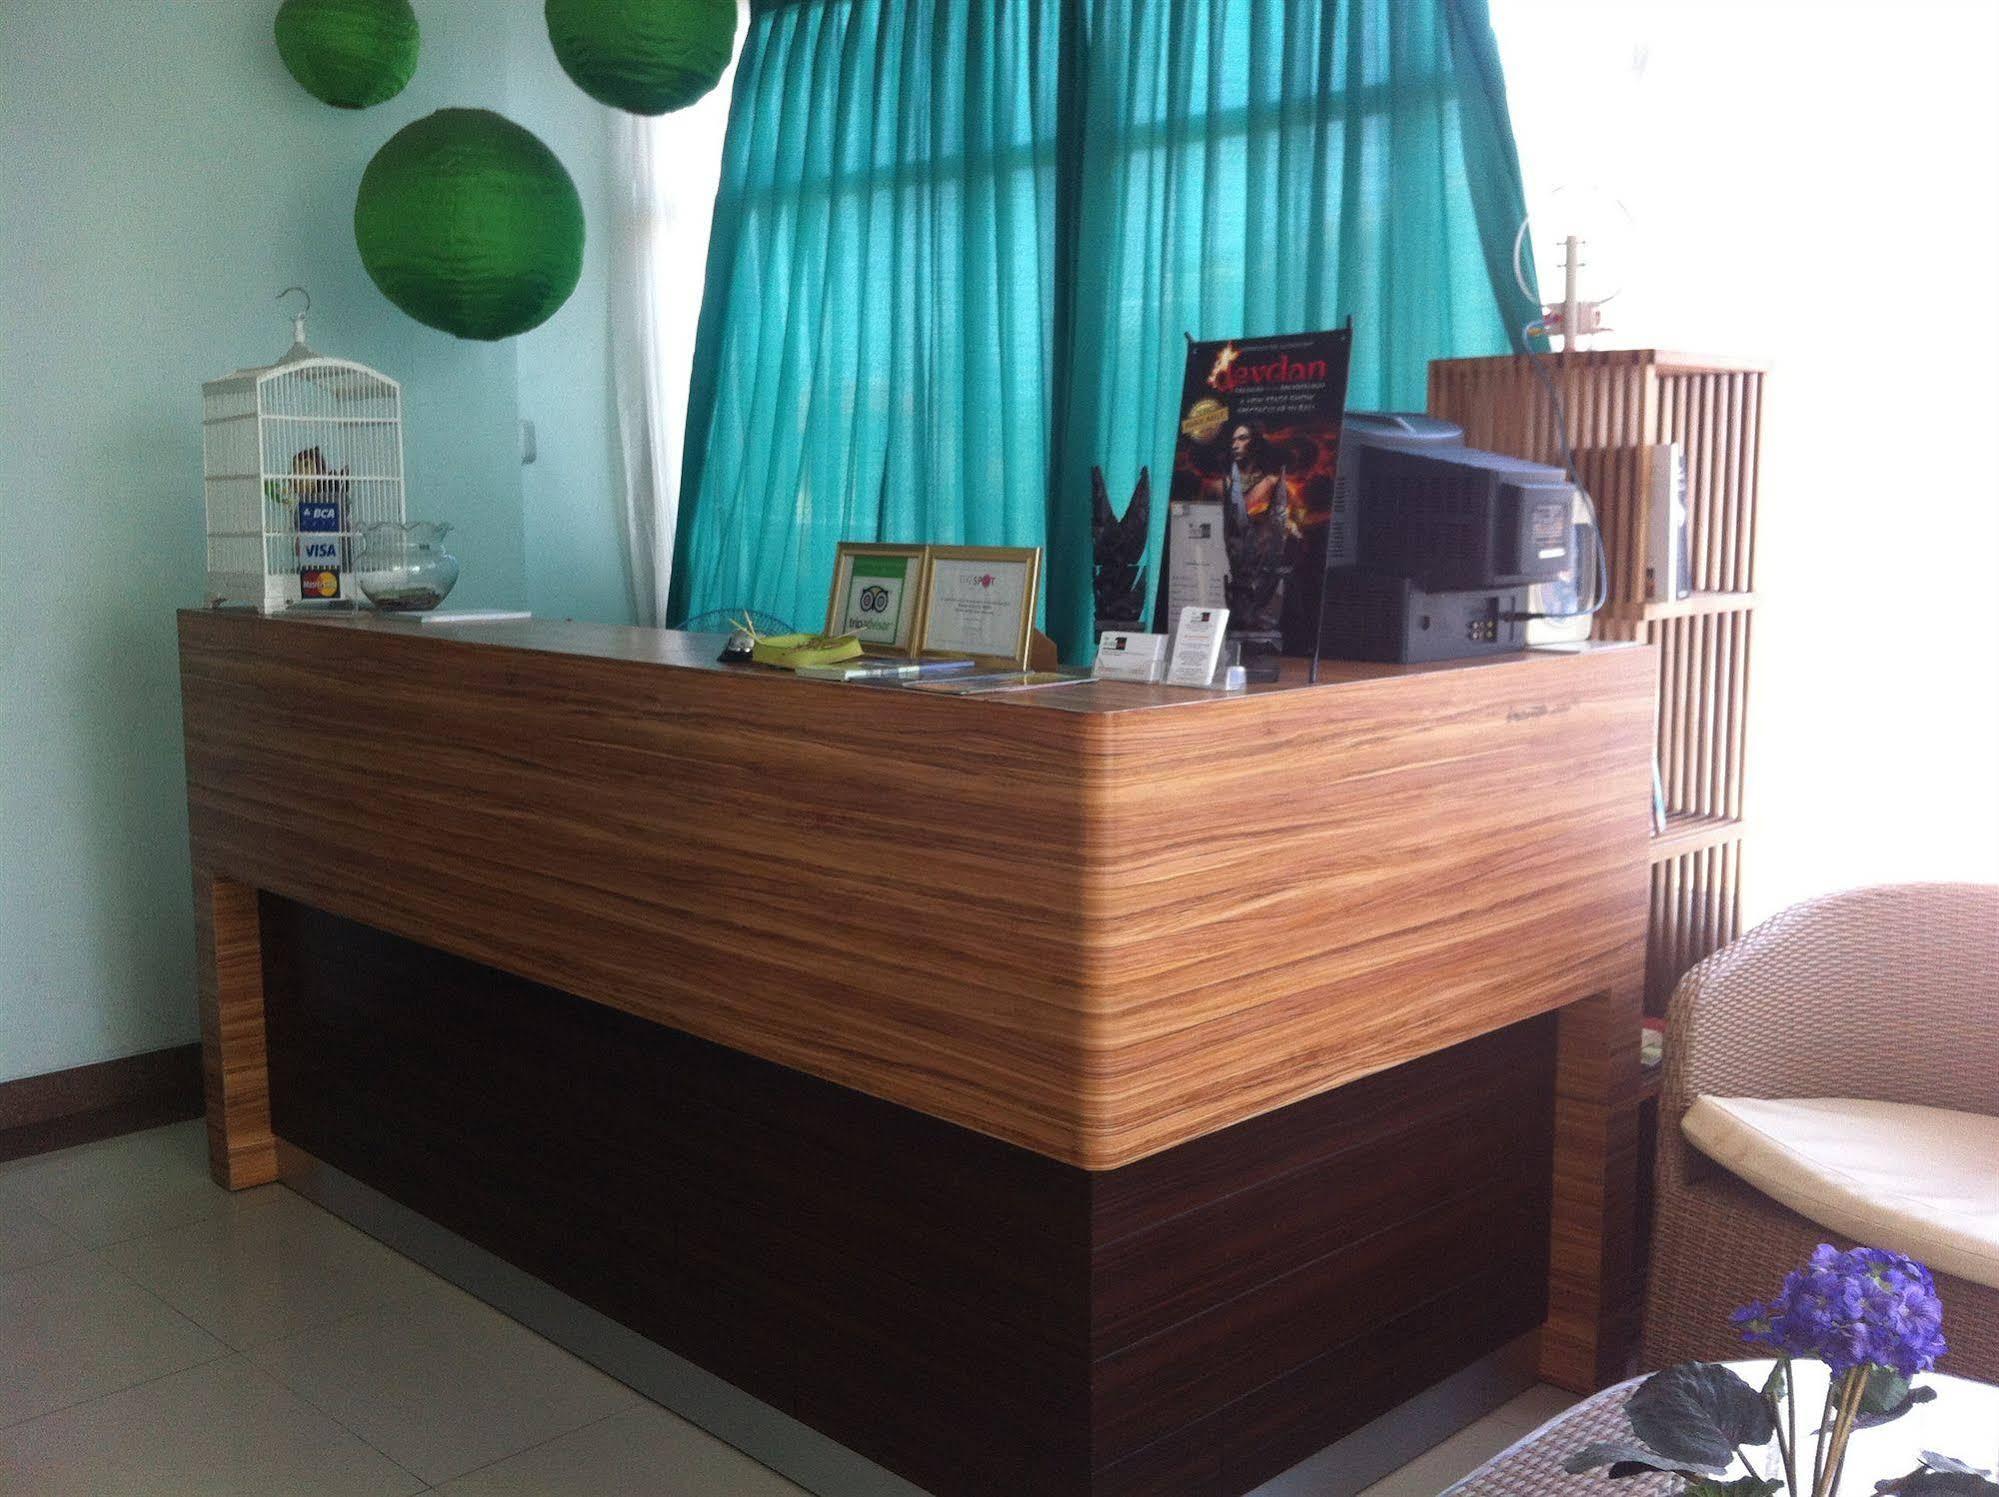 The Studio One at Nusa Dua